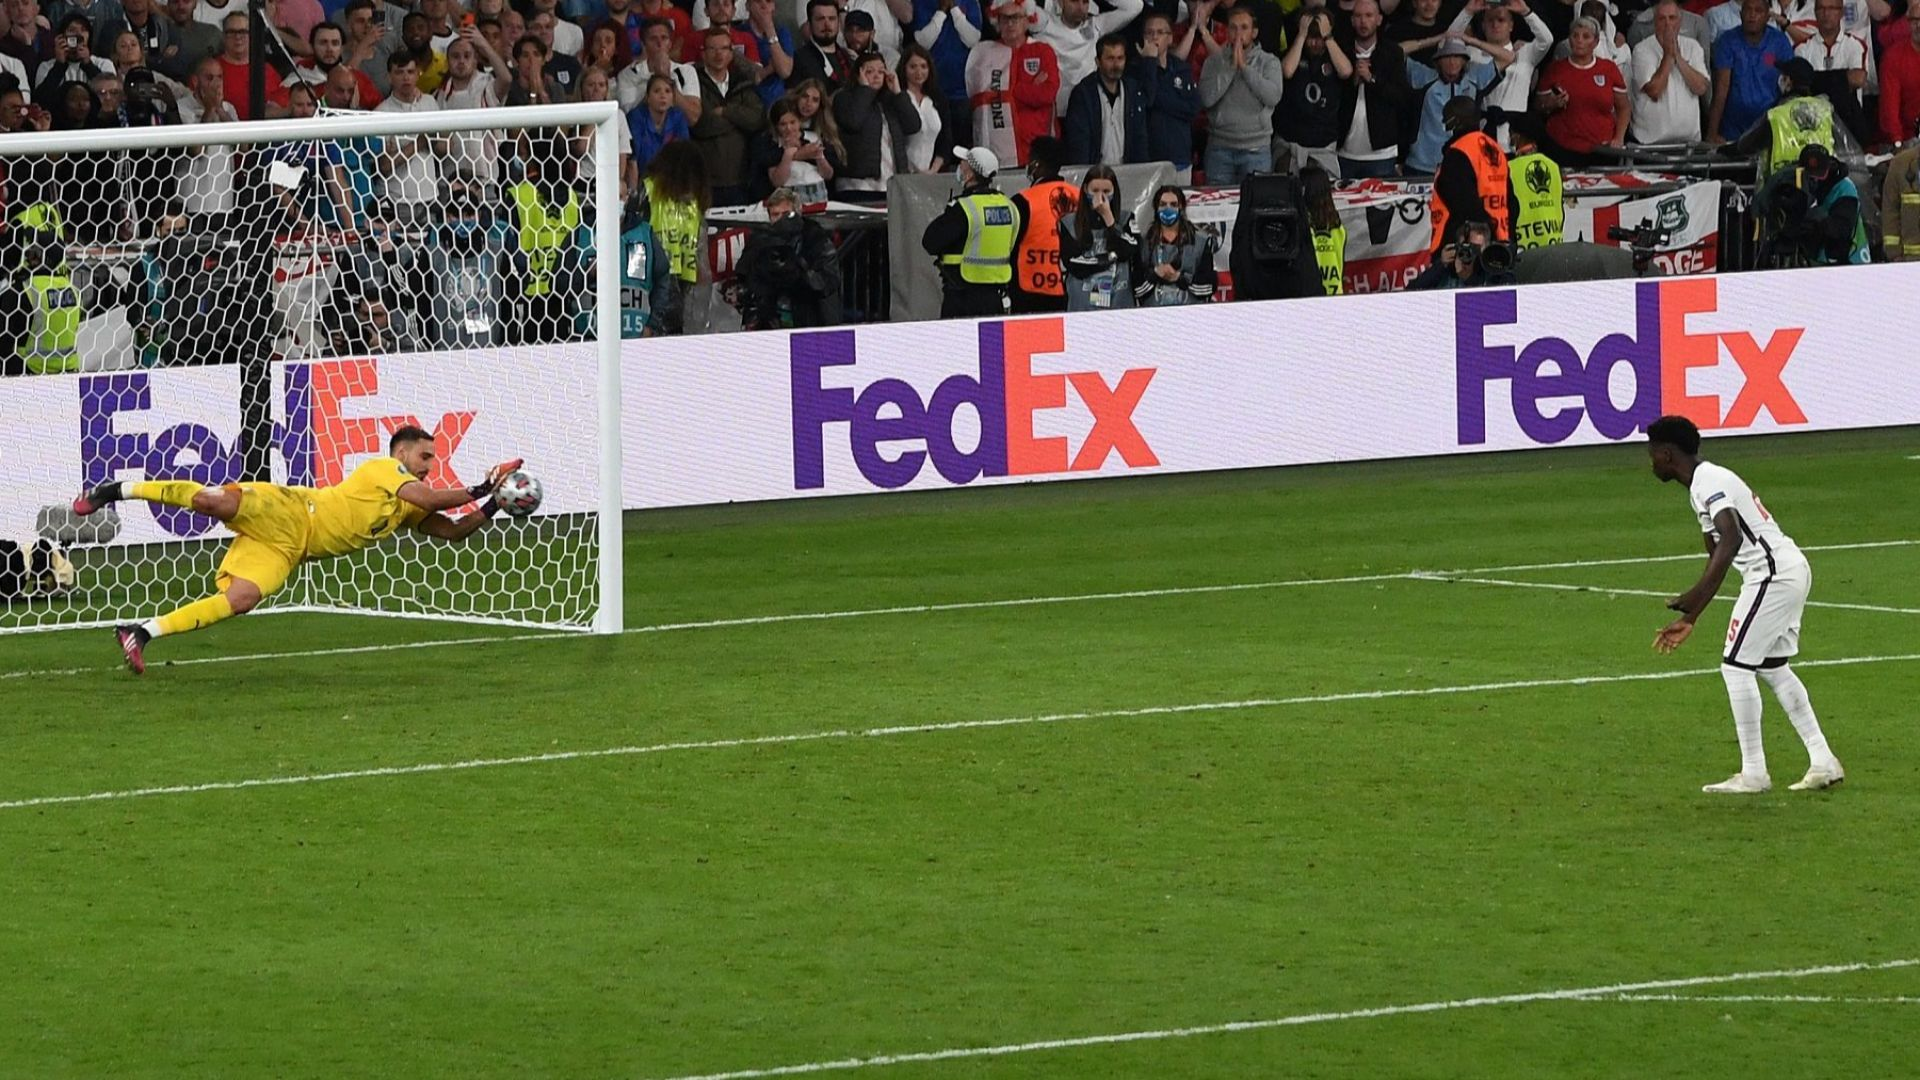 Портсмут изгони трима играчи заради обиди към английските национали